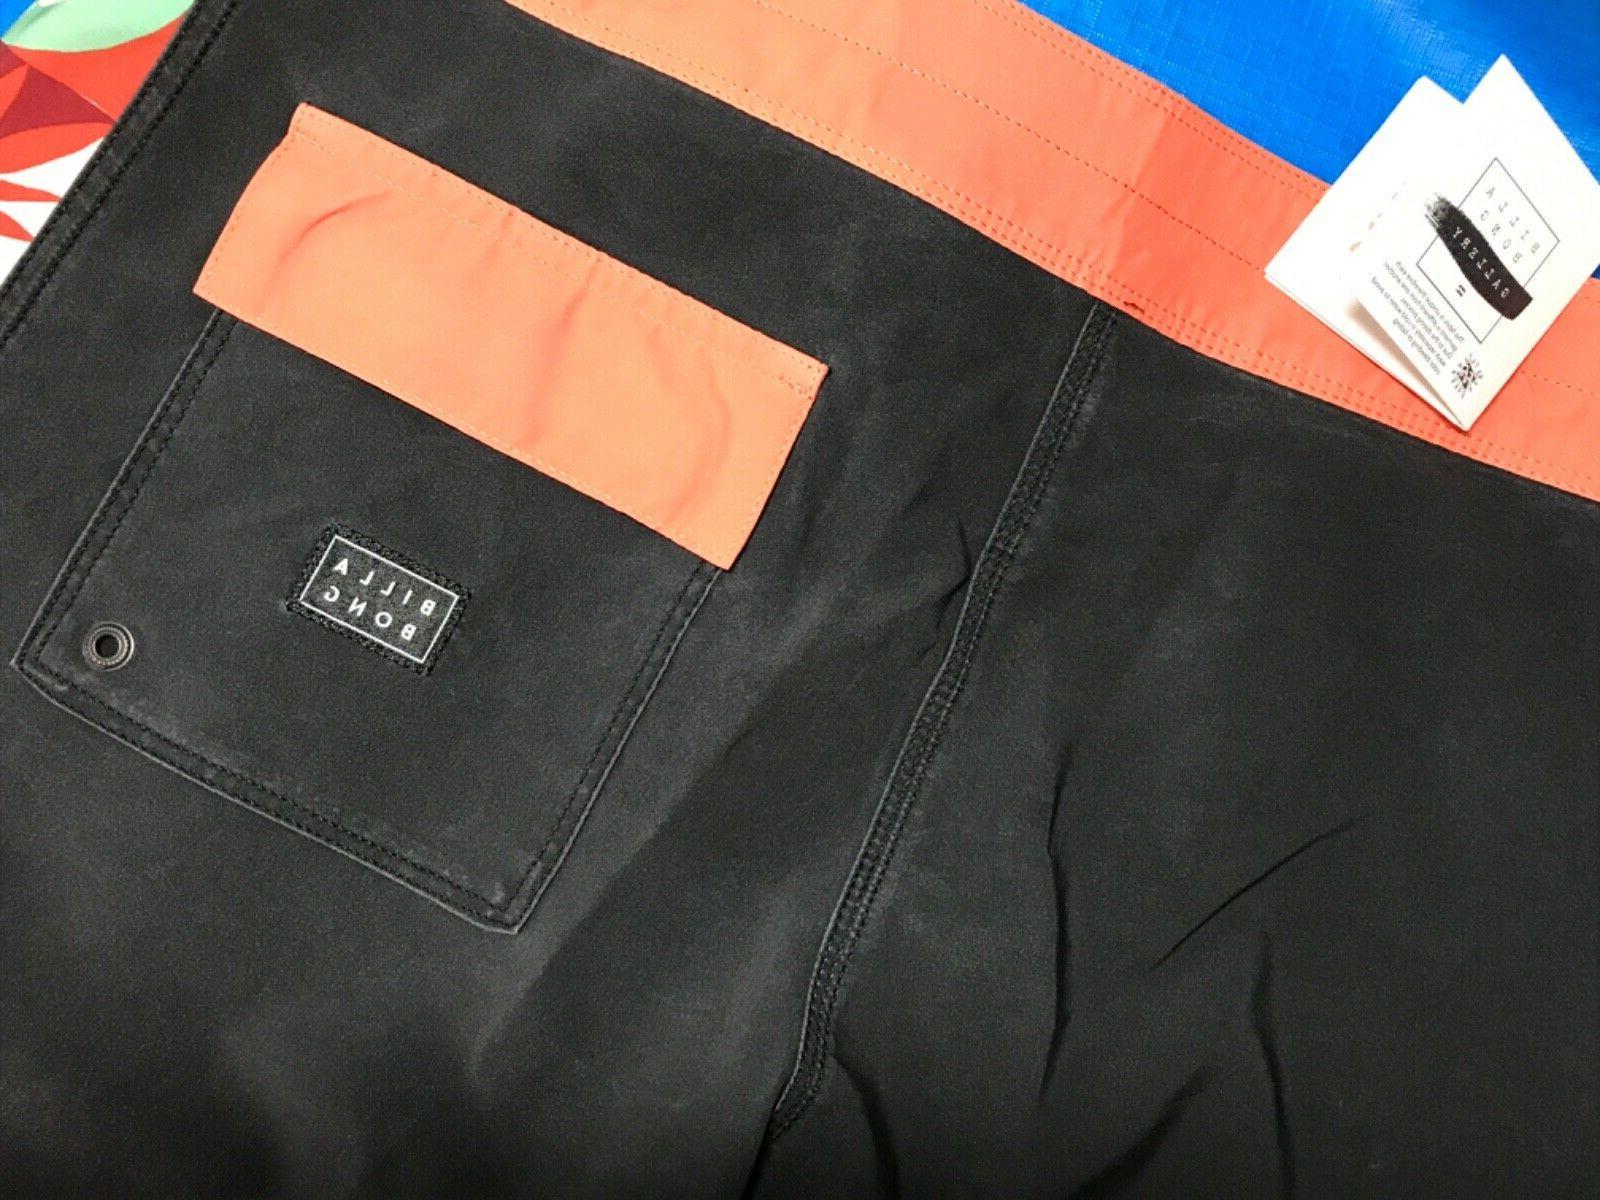 NWT Billabong Men's Patrol Board Shorts Trunks 34